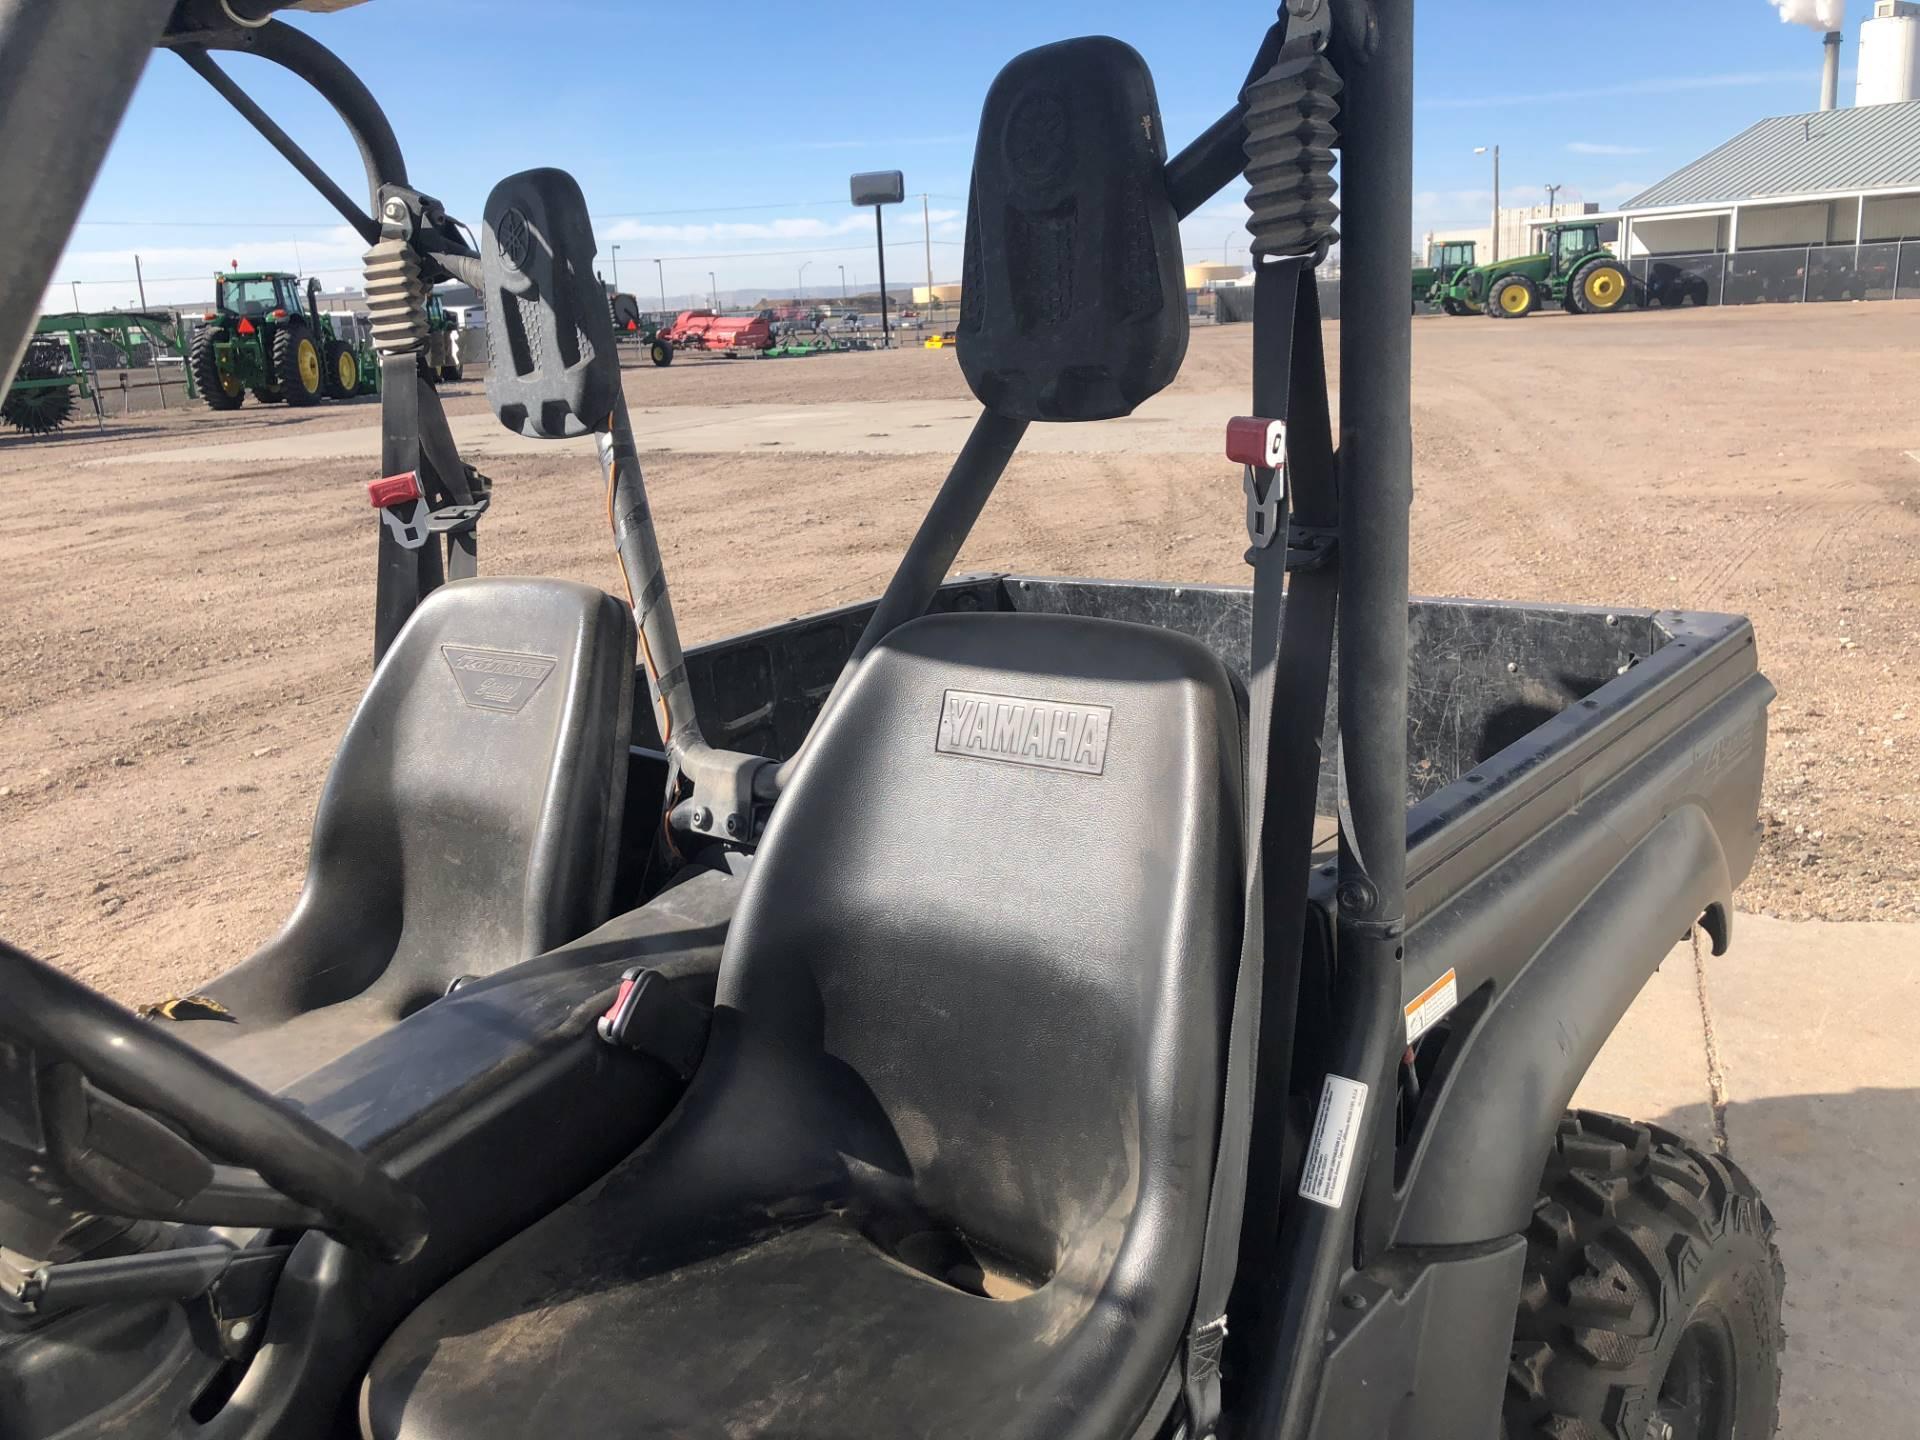 Used 2013 Yamaha Rhino 700 Fi Auto 4x4 Special Edition Utility Fuel Filter Location In Scottsbluff Nebraska